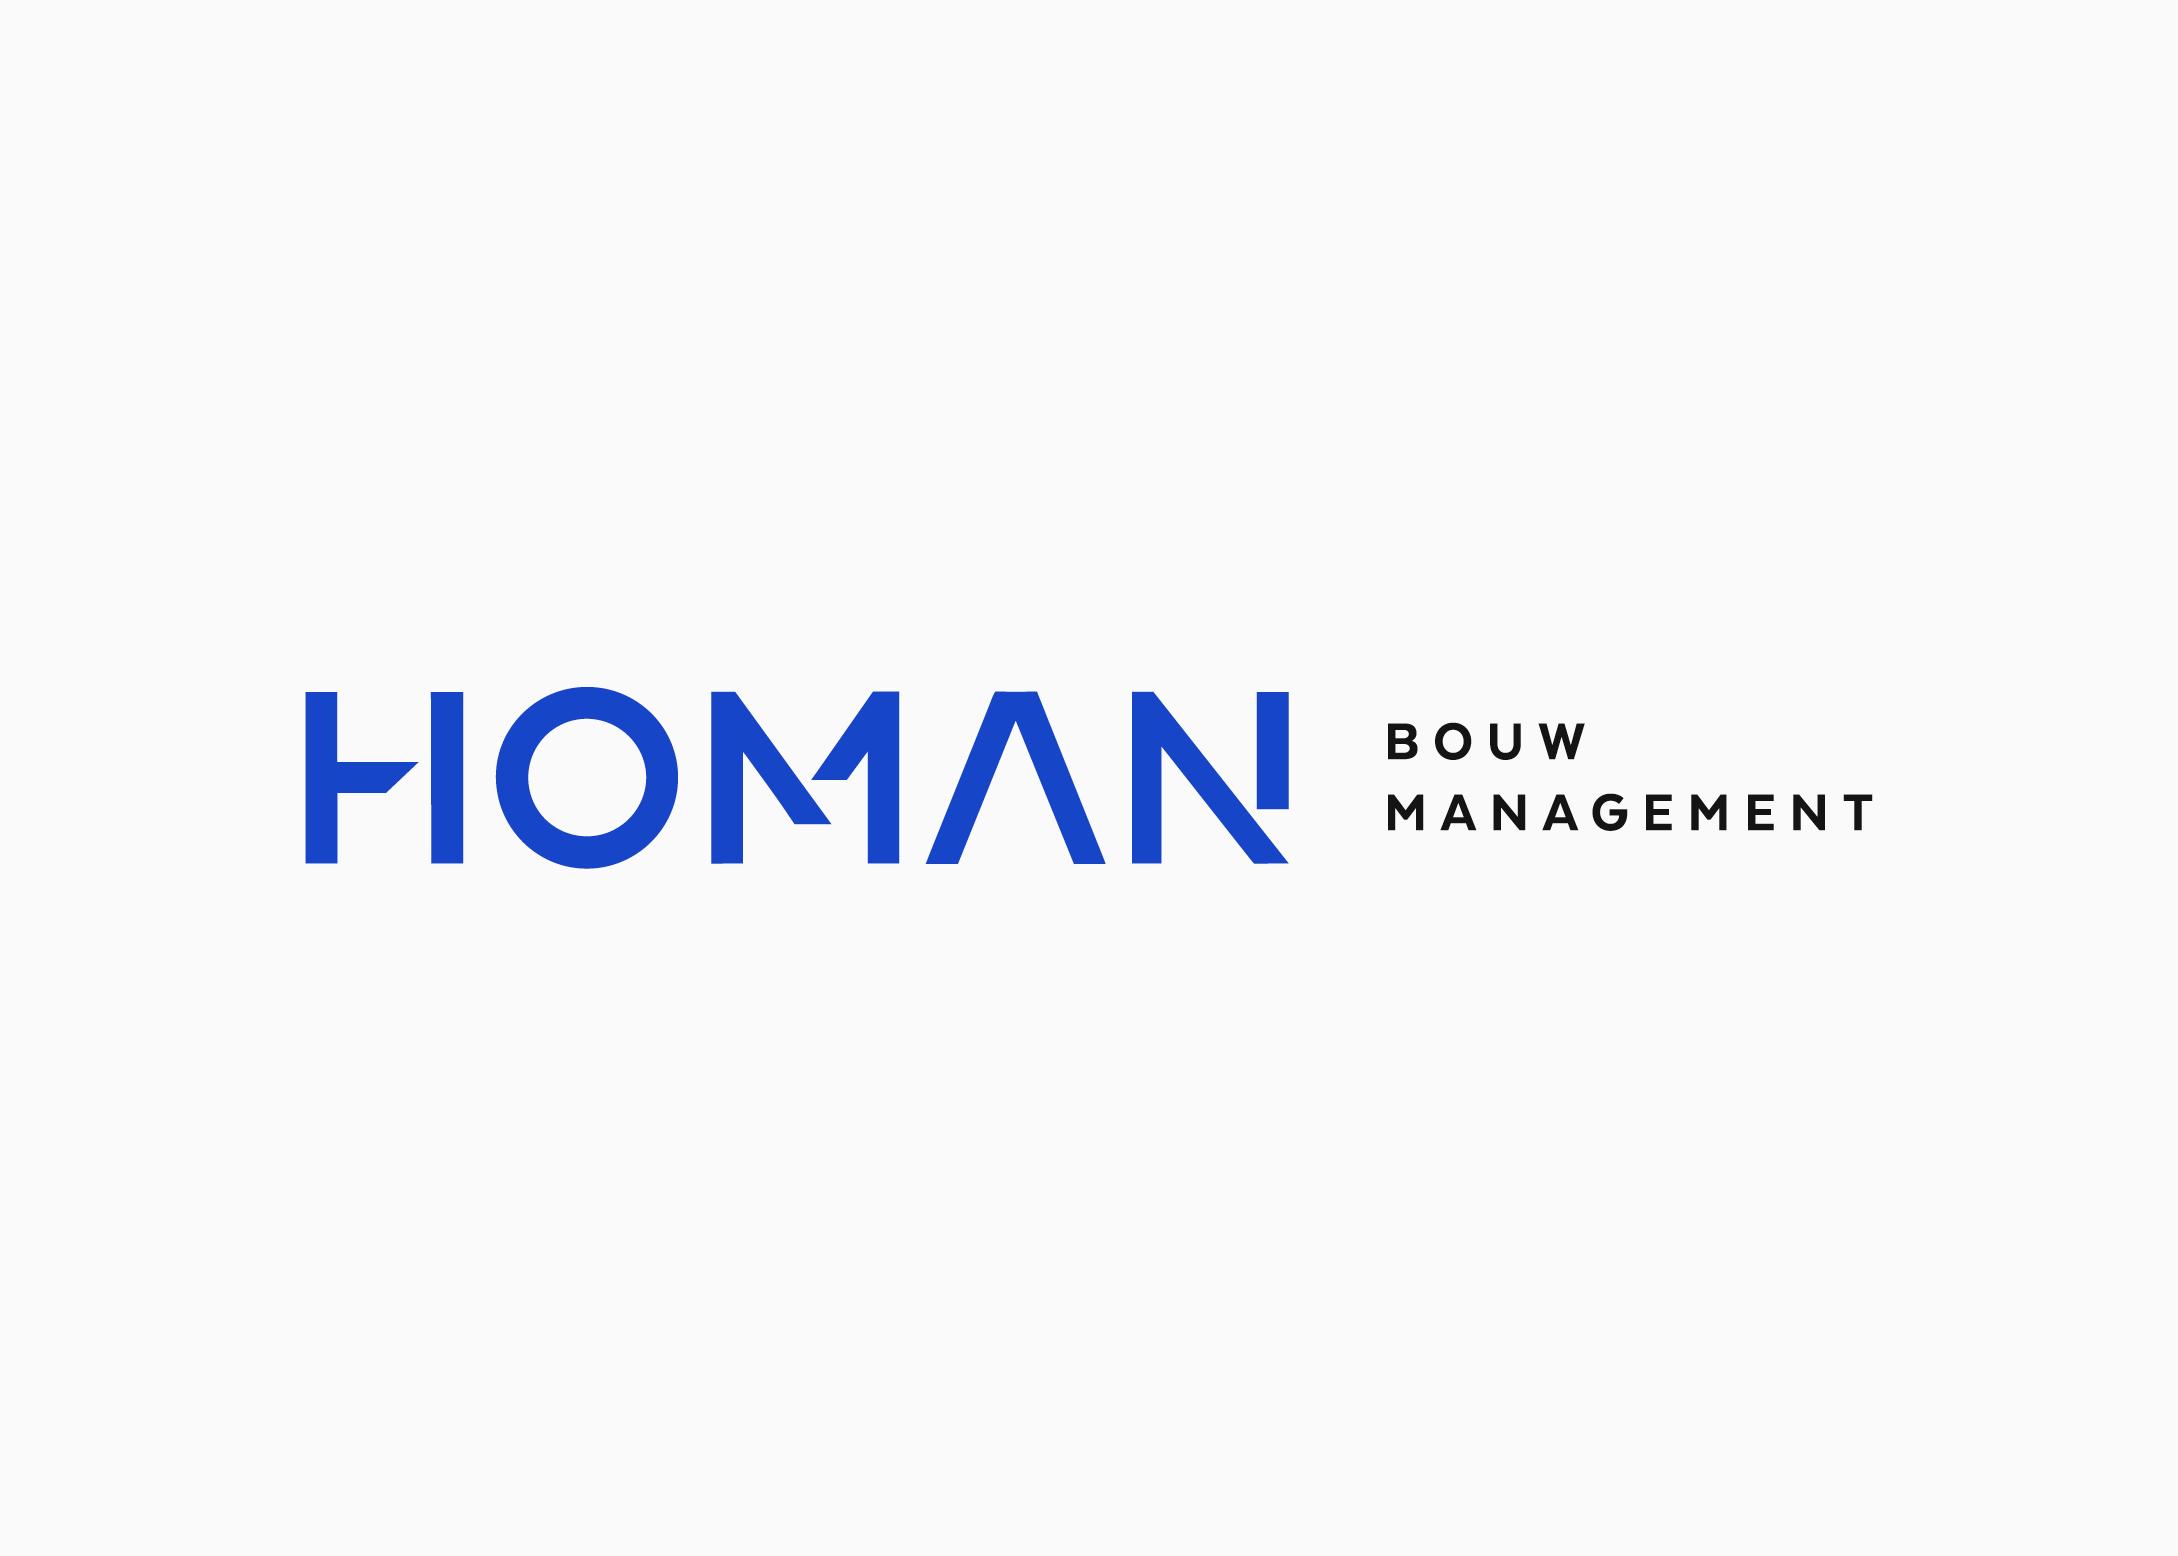 Logo-ontwerp-Homan-bouwmanagement-logodesigner-burowit-Thirza-Bakker